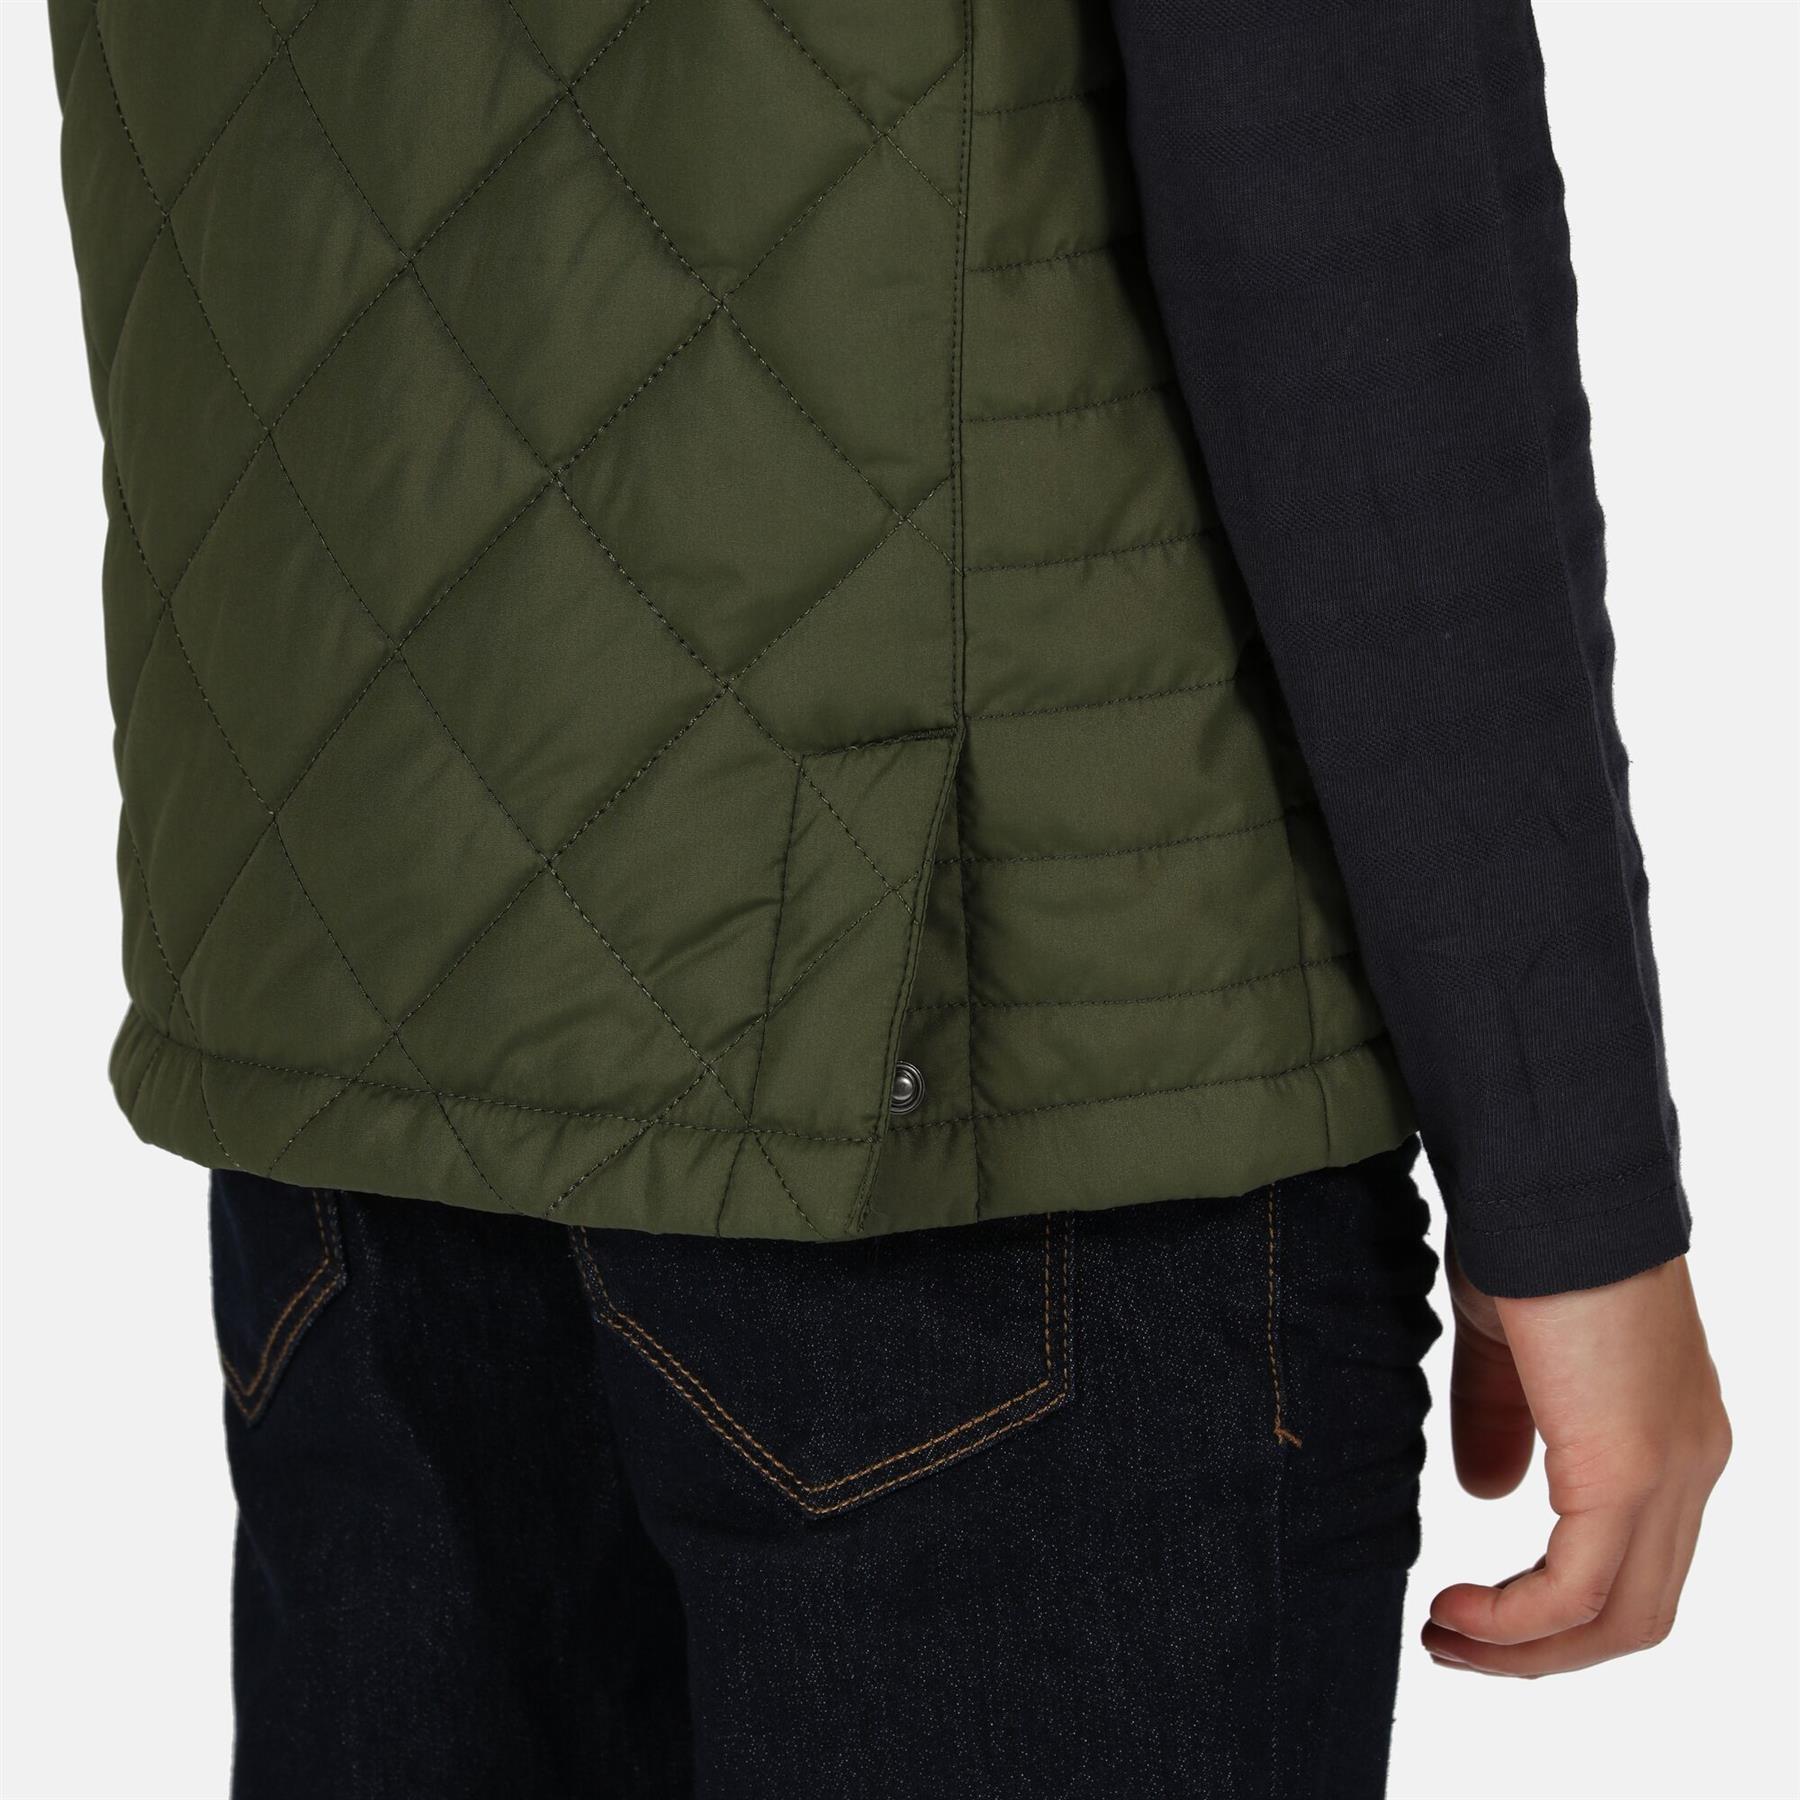 miniatuur 5 - Regatta Kids Zion Quilted Insulated Bodywarmer Gilet Zip Pockets